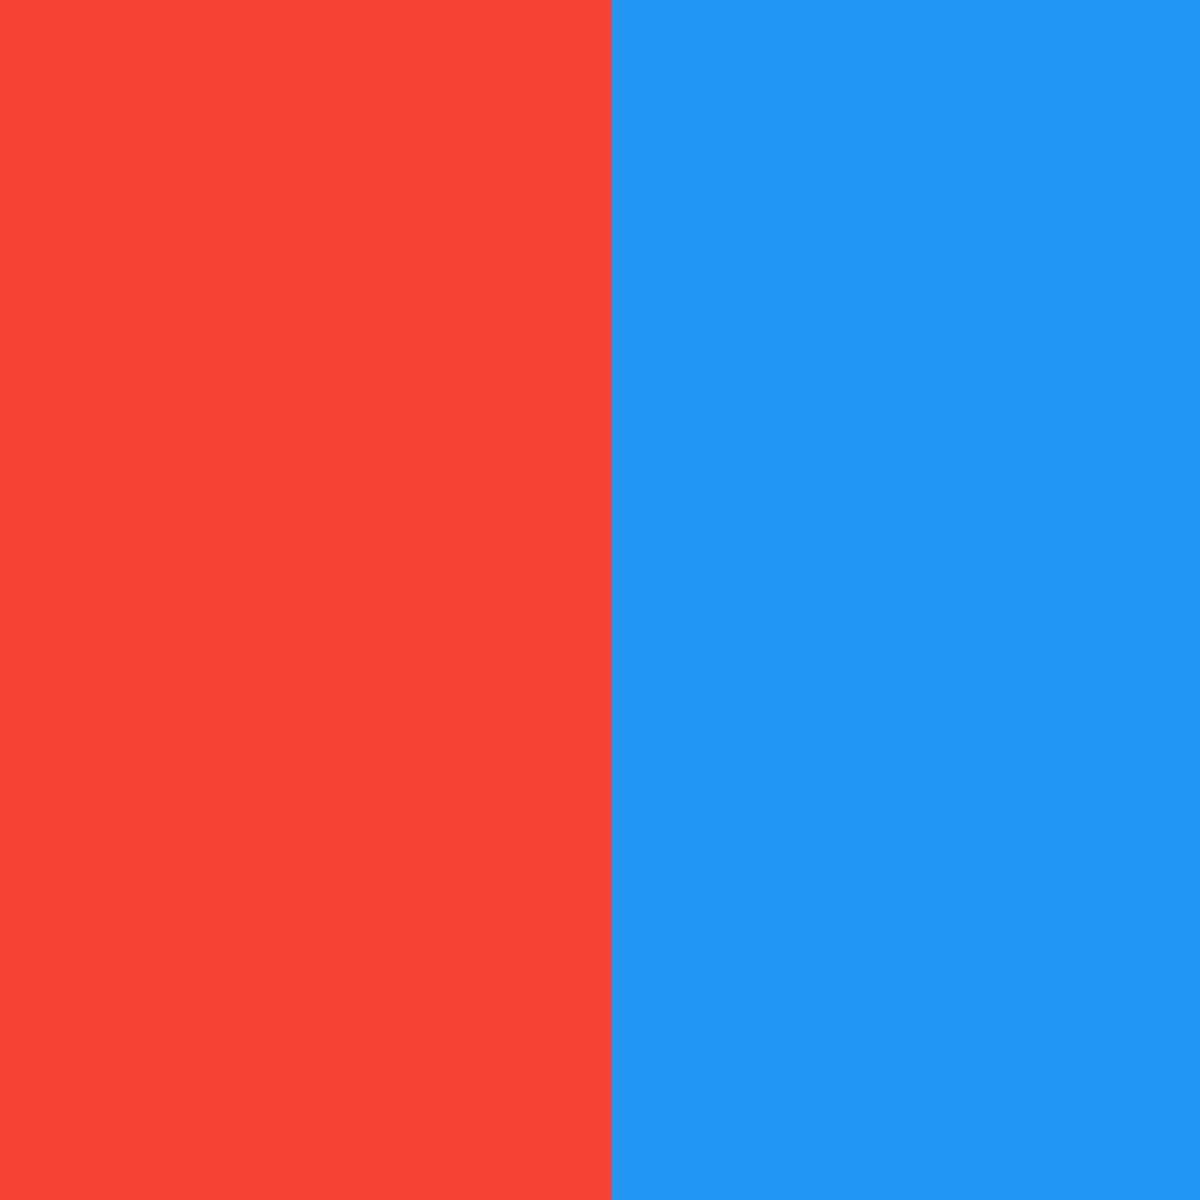 2 colours by petsa11